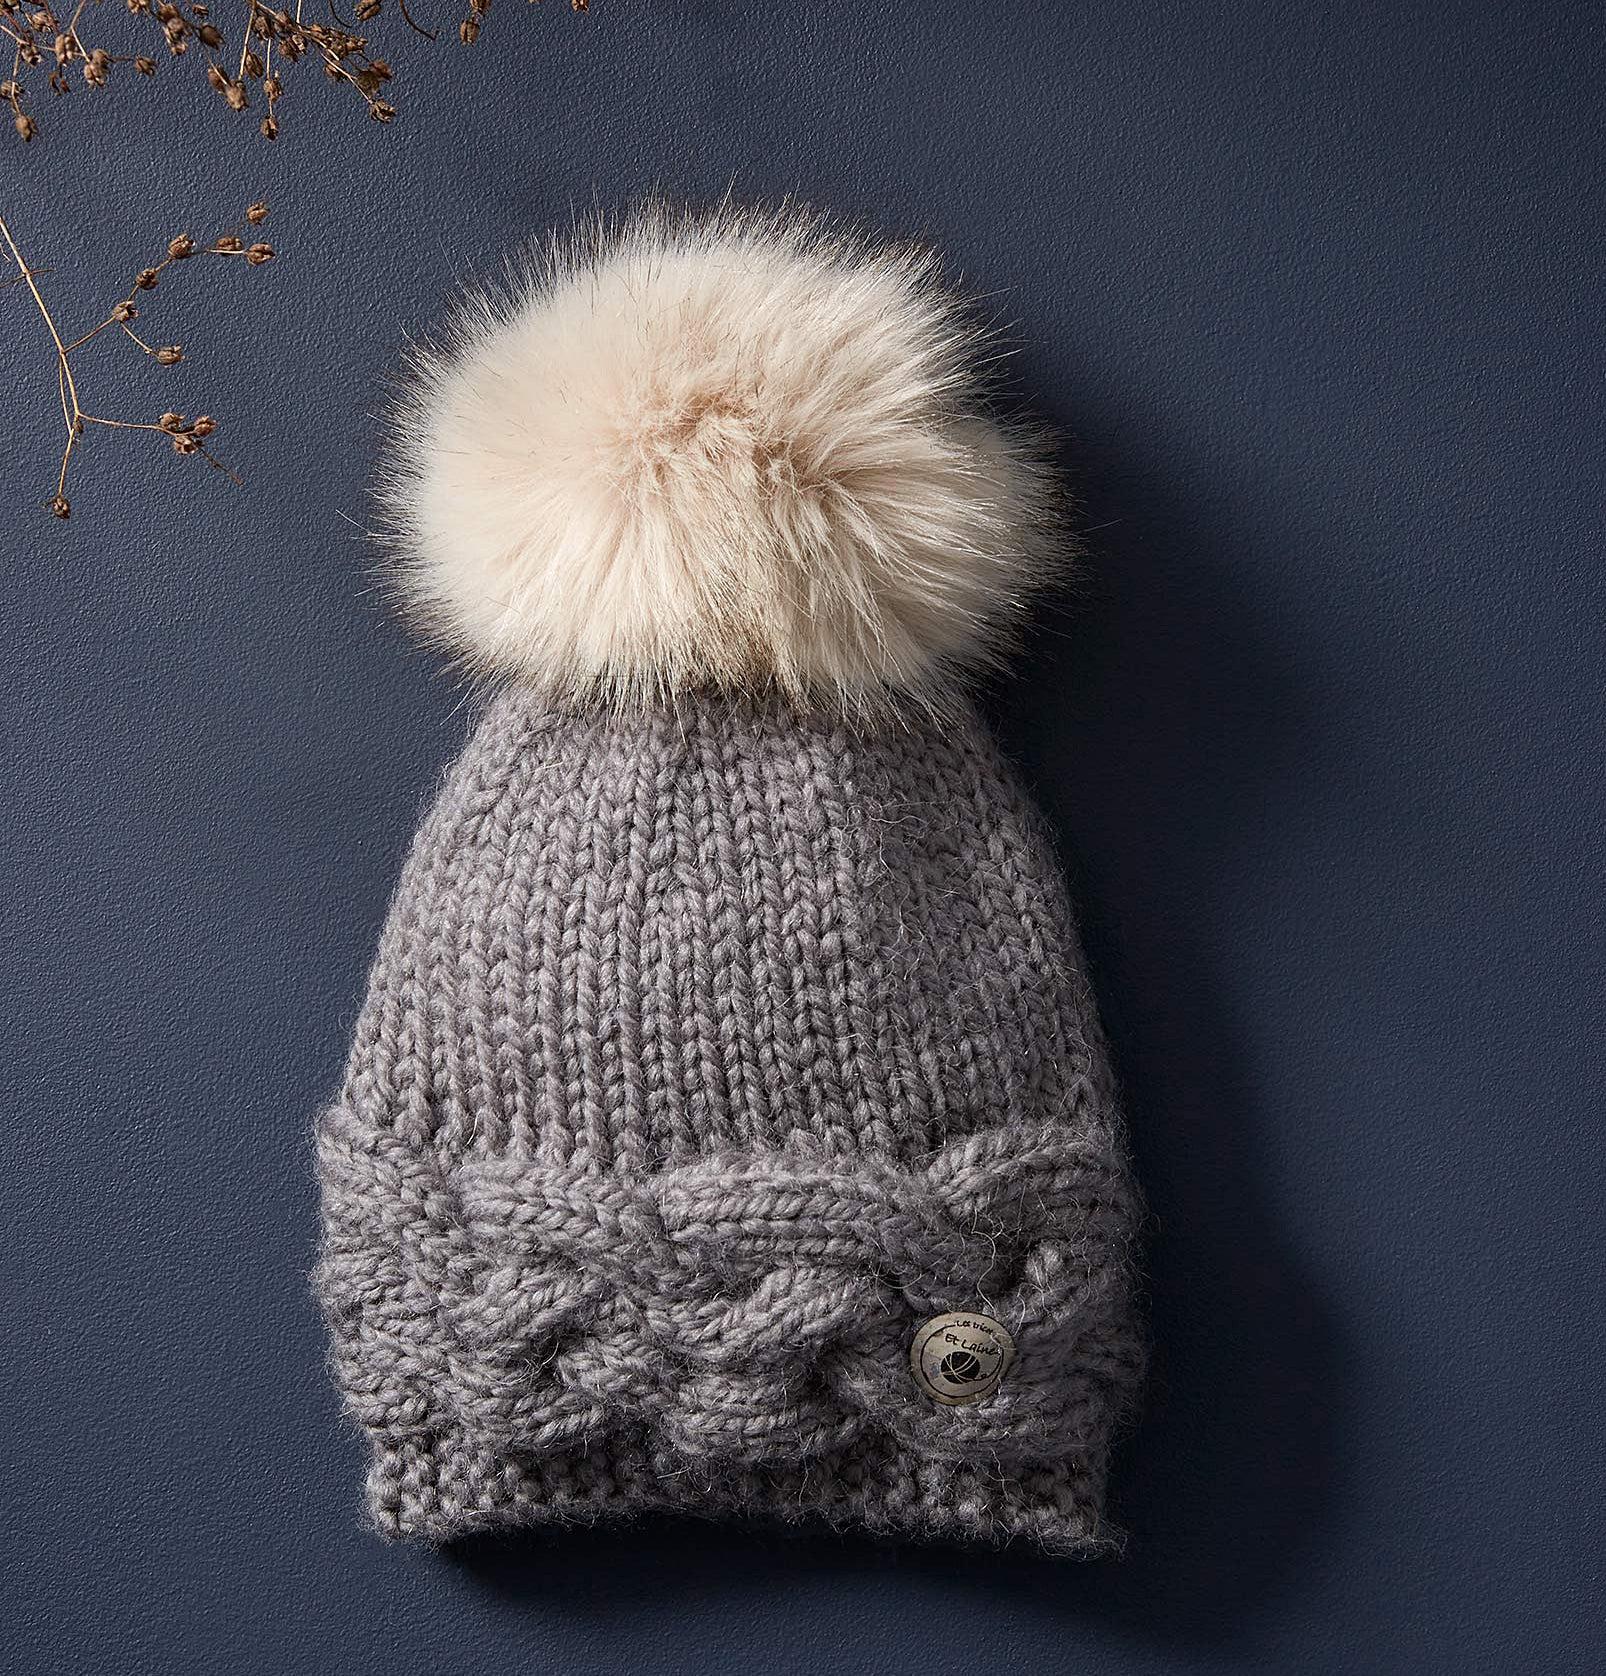 A knit hat with a pom pom on top lying on a plain background